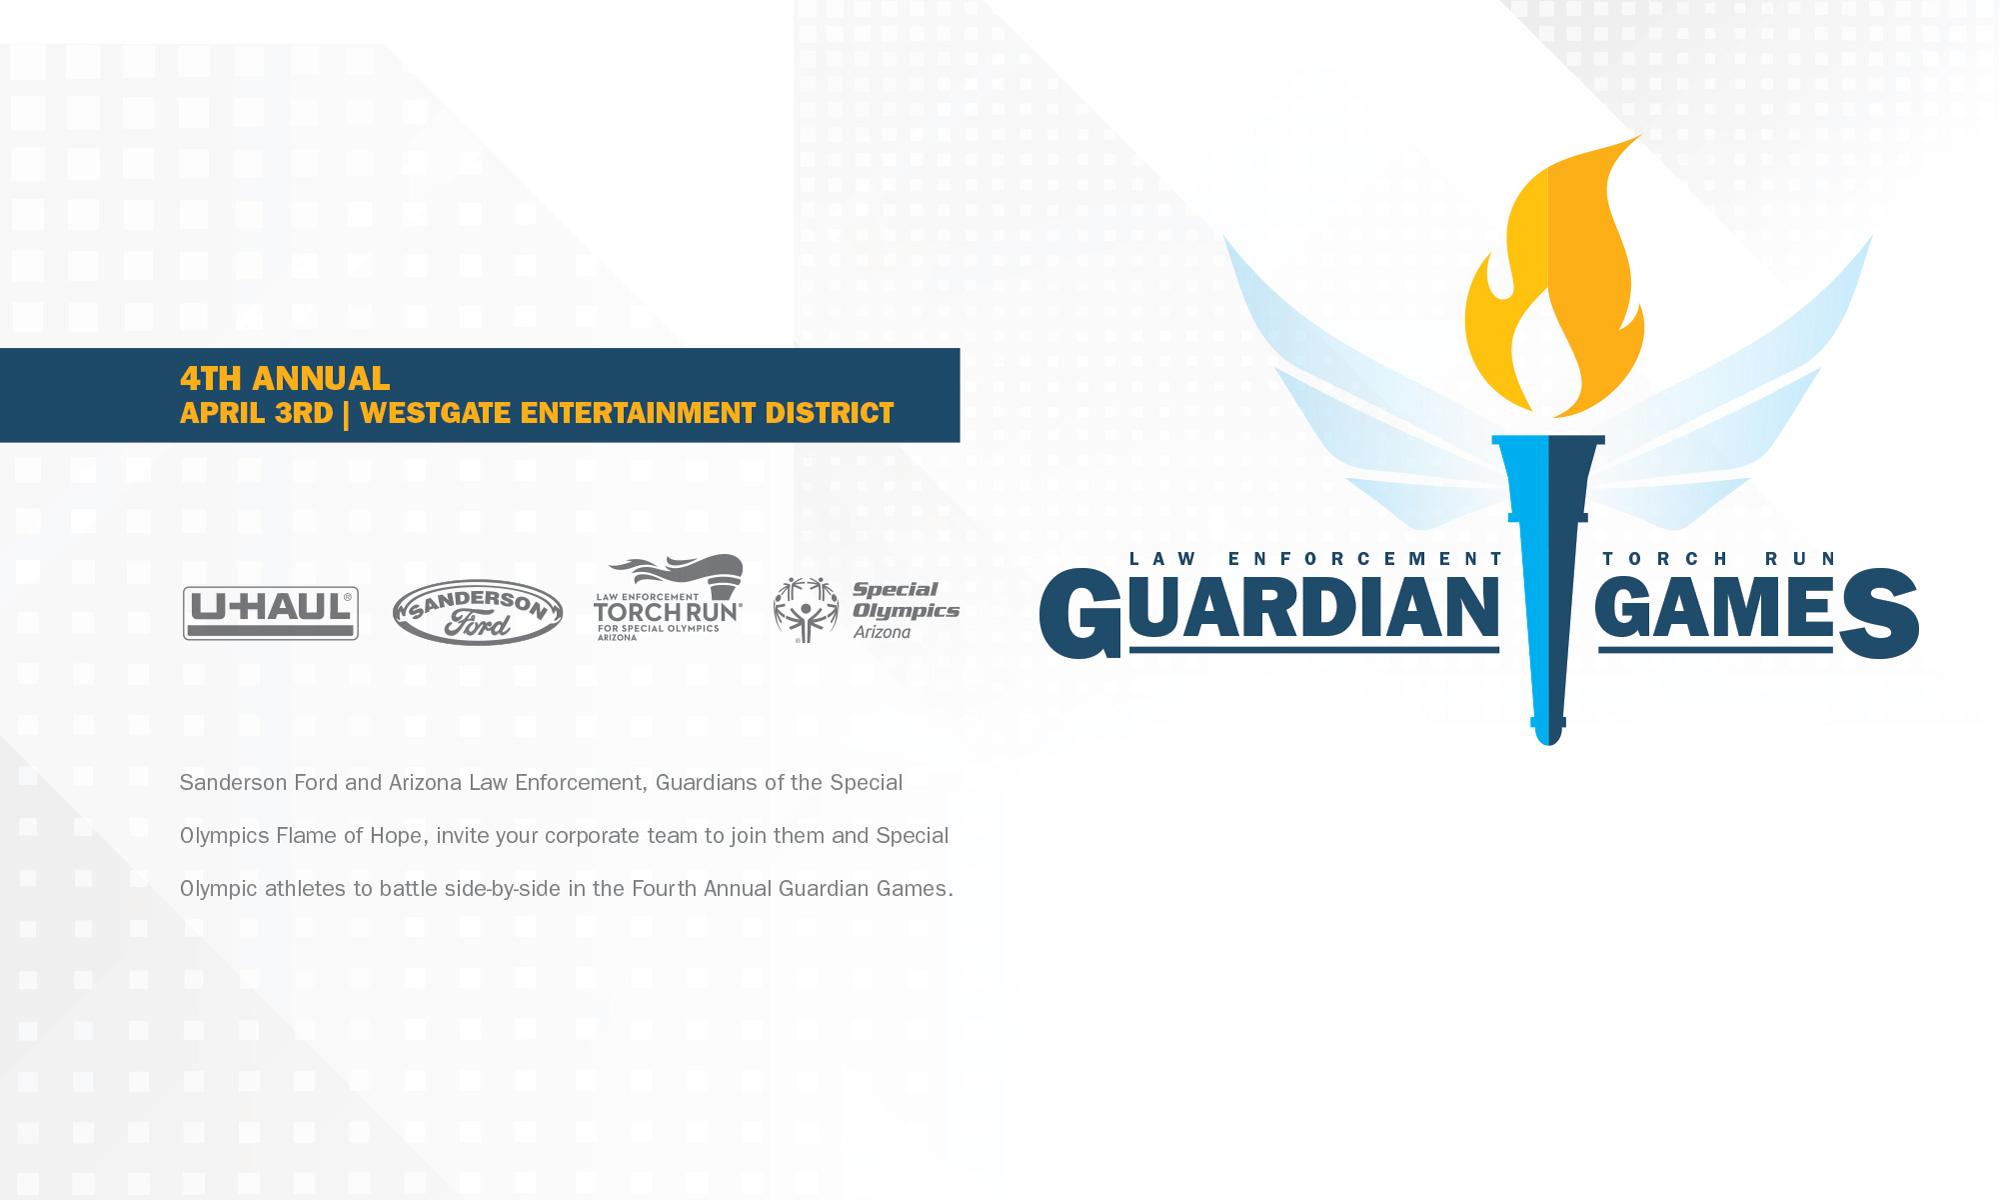 Sanderson Guardian Games